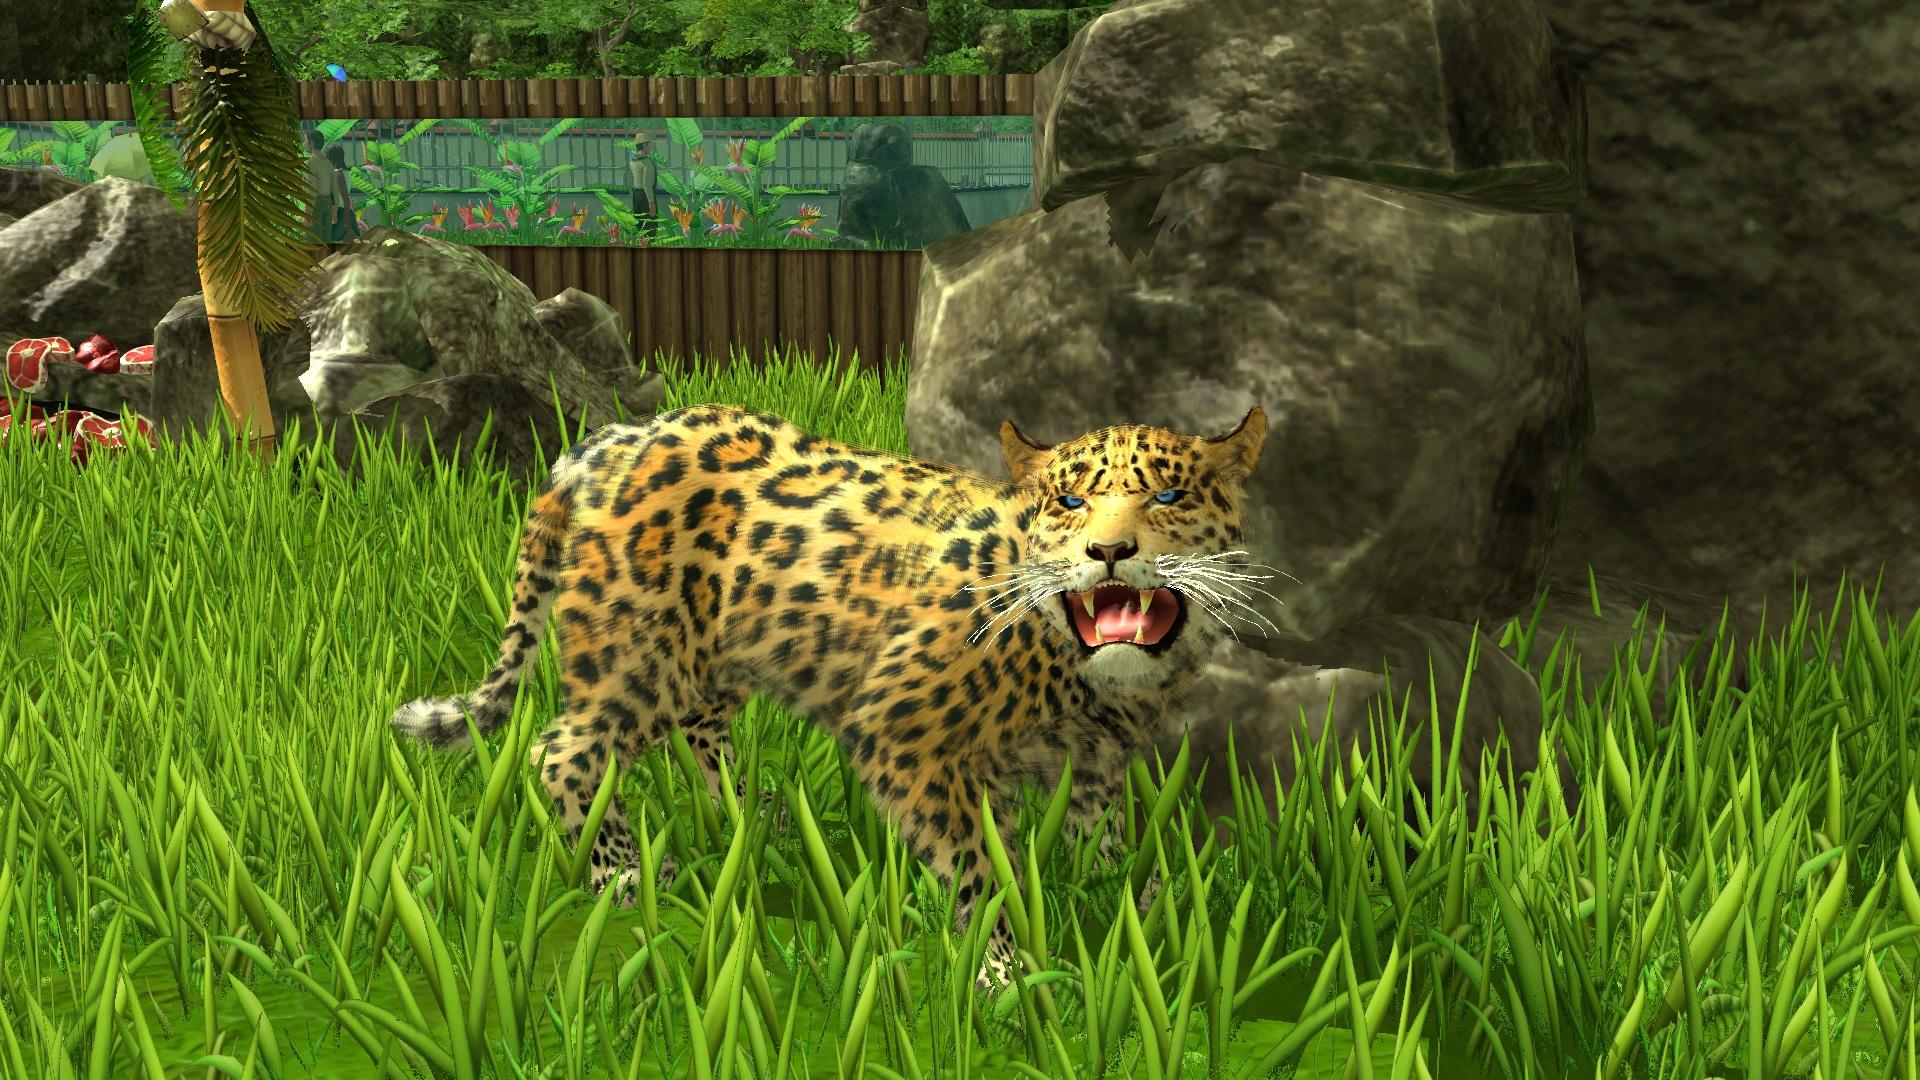 jaguar wildlife park 2 wiki fandom powered by wikia. Black Bedroom Furniture Sets. Home Design Ideas